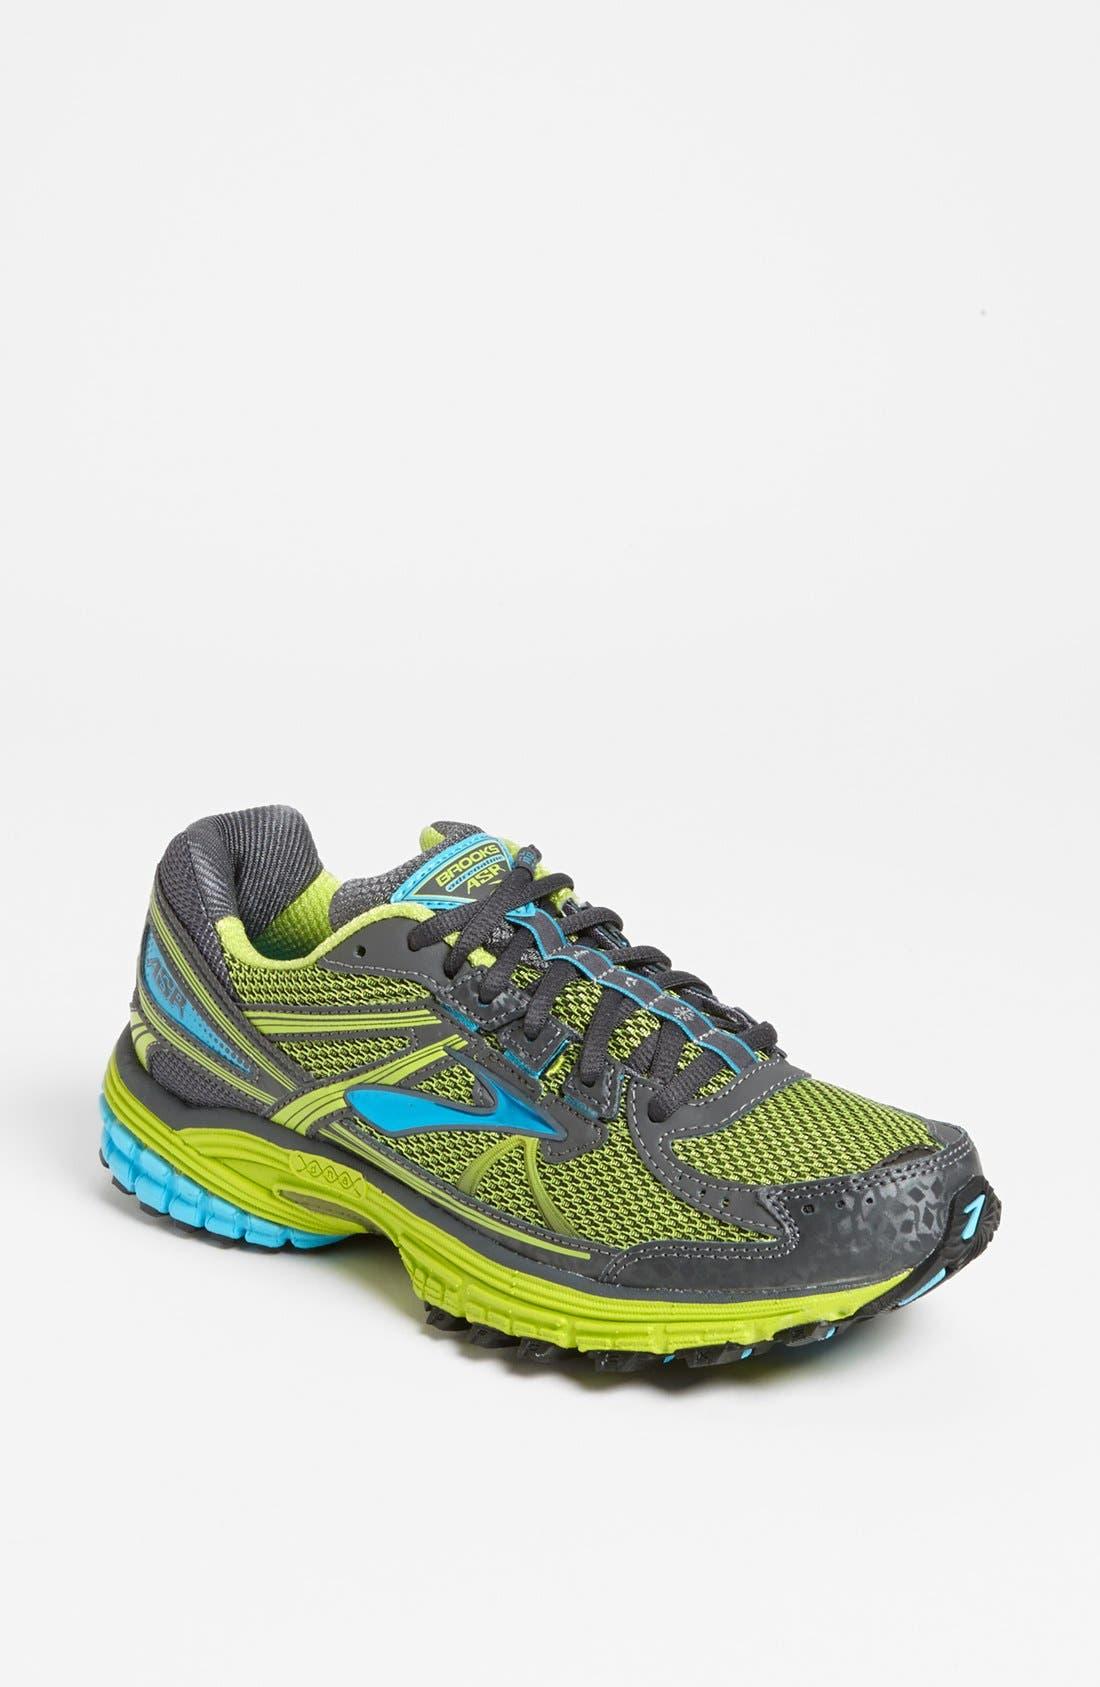 Main Image - Brooks 'Adrenaline ASR 10' Trail Running Shoe (Women)